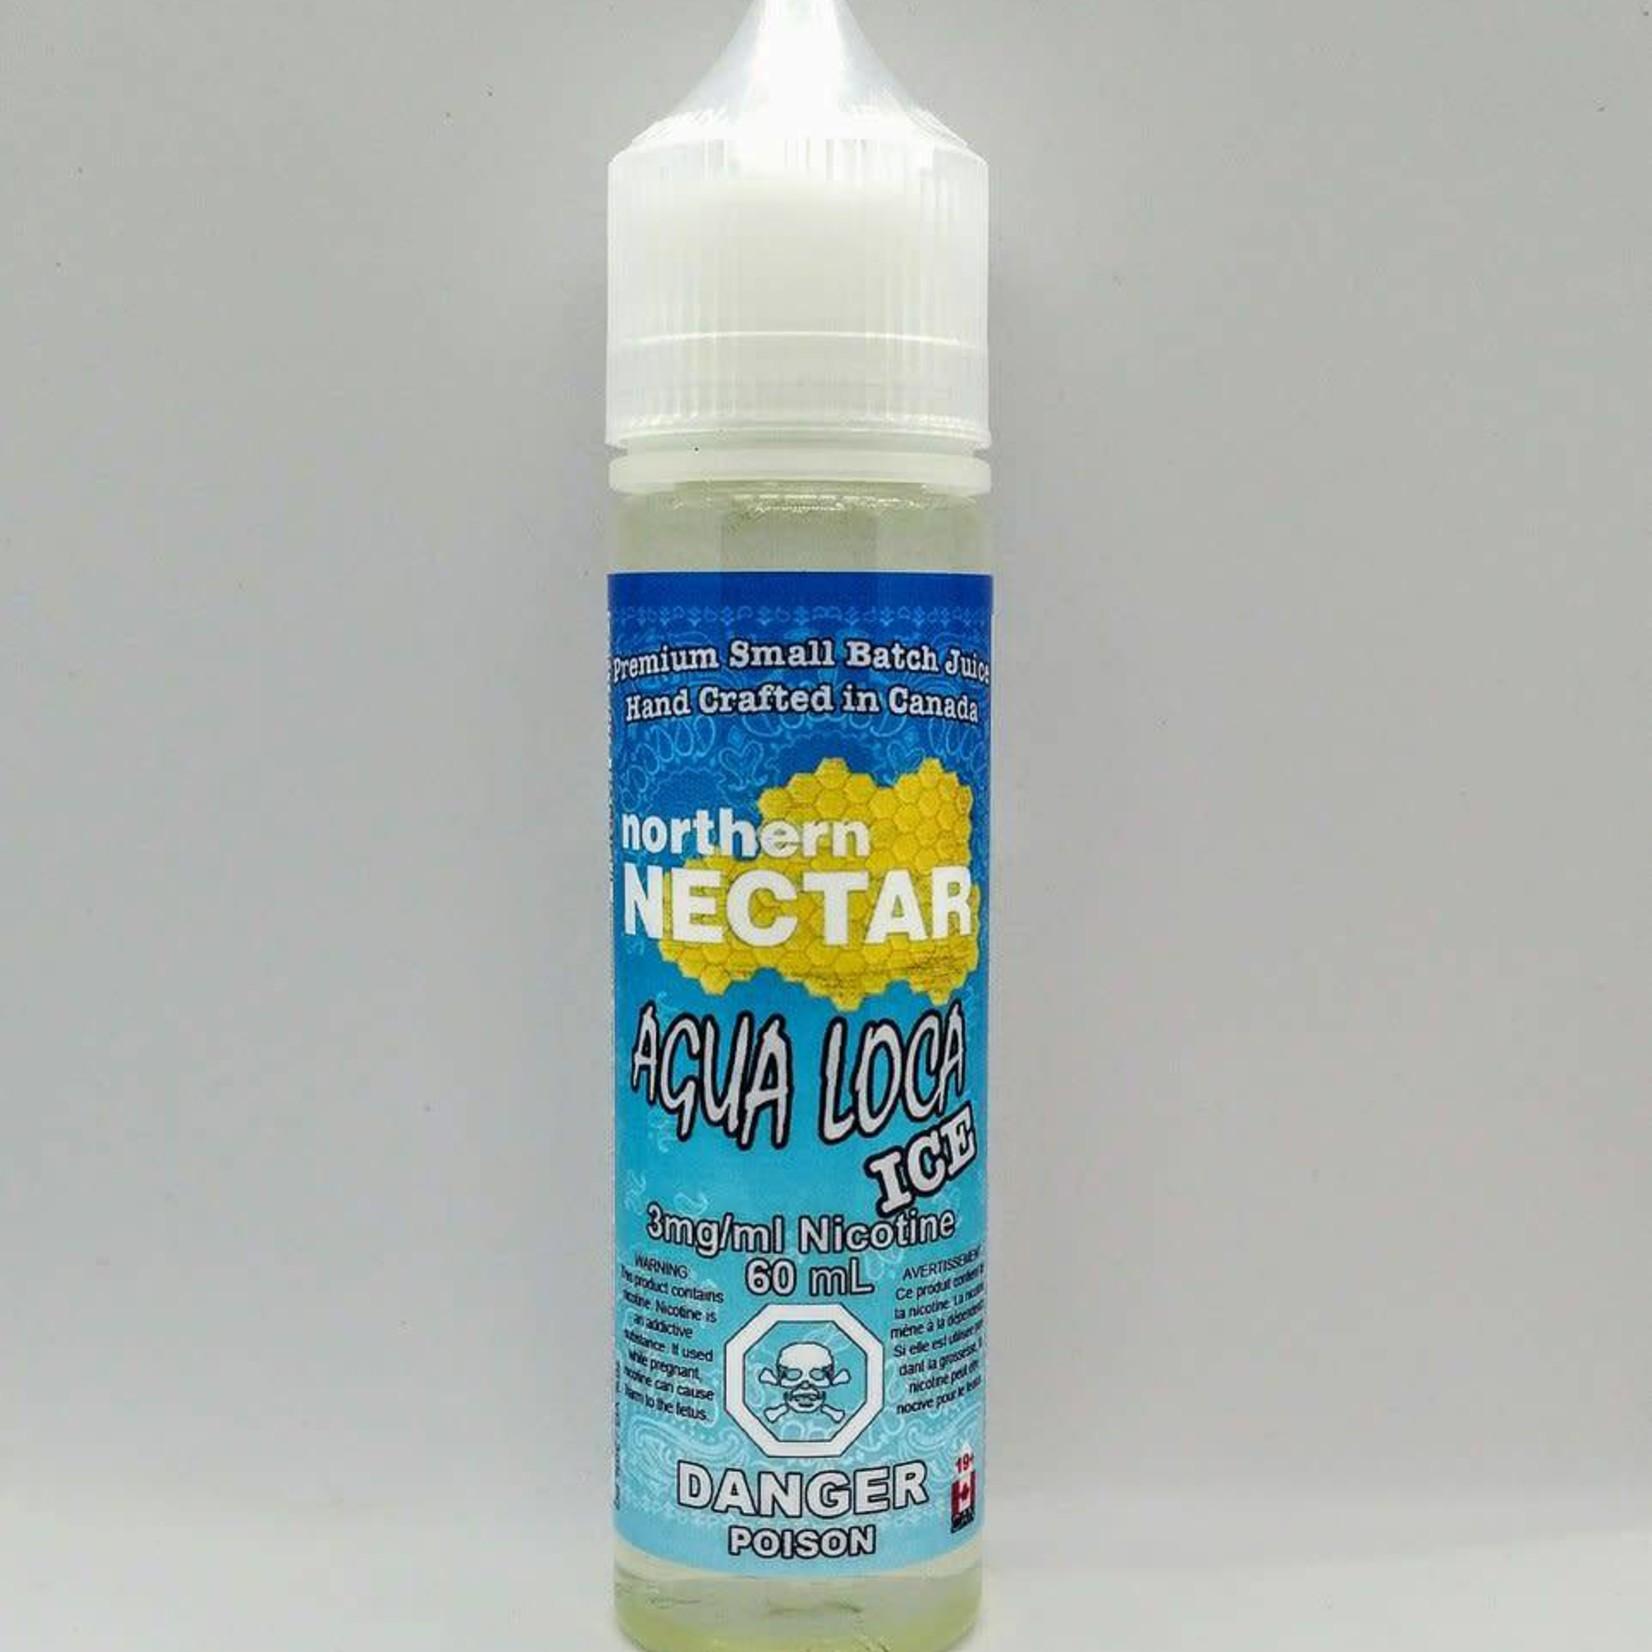 Northern Nectar - Agua Loca ICE